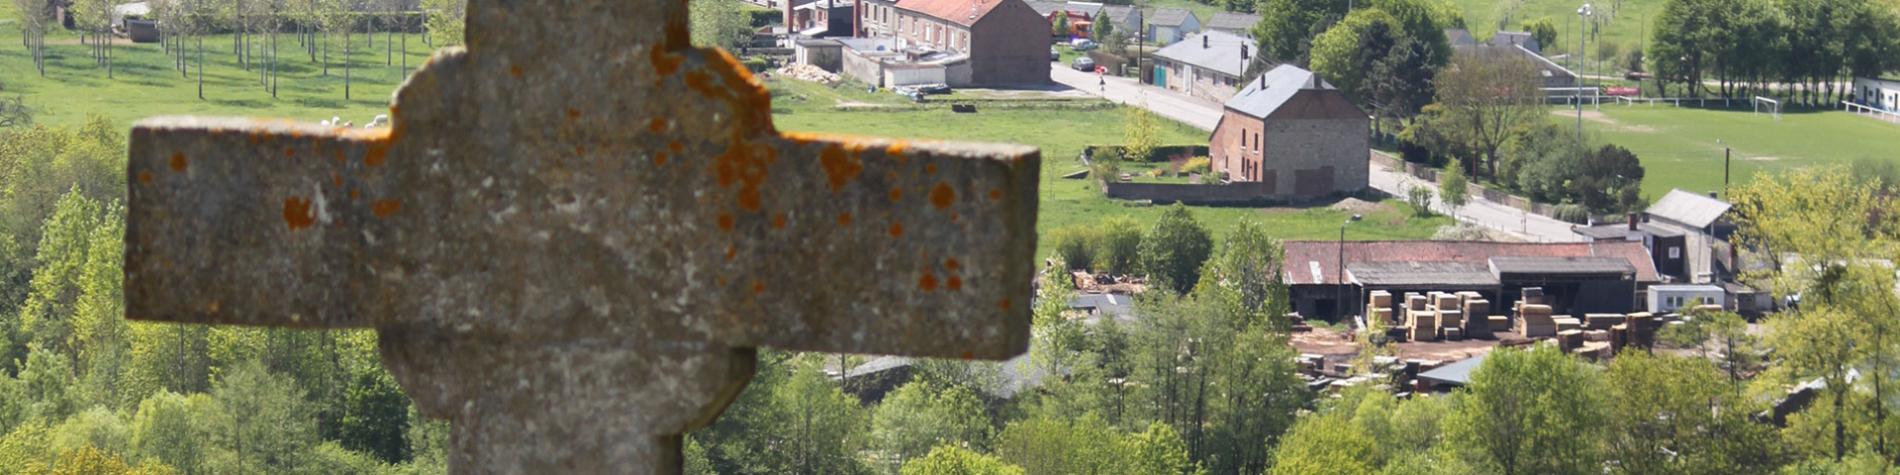 Roche à Lomme - Wallonie insolite